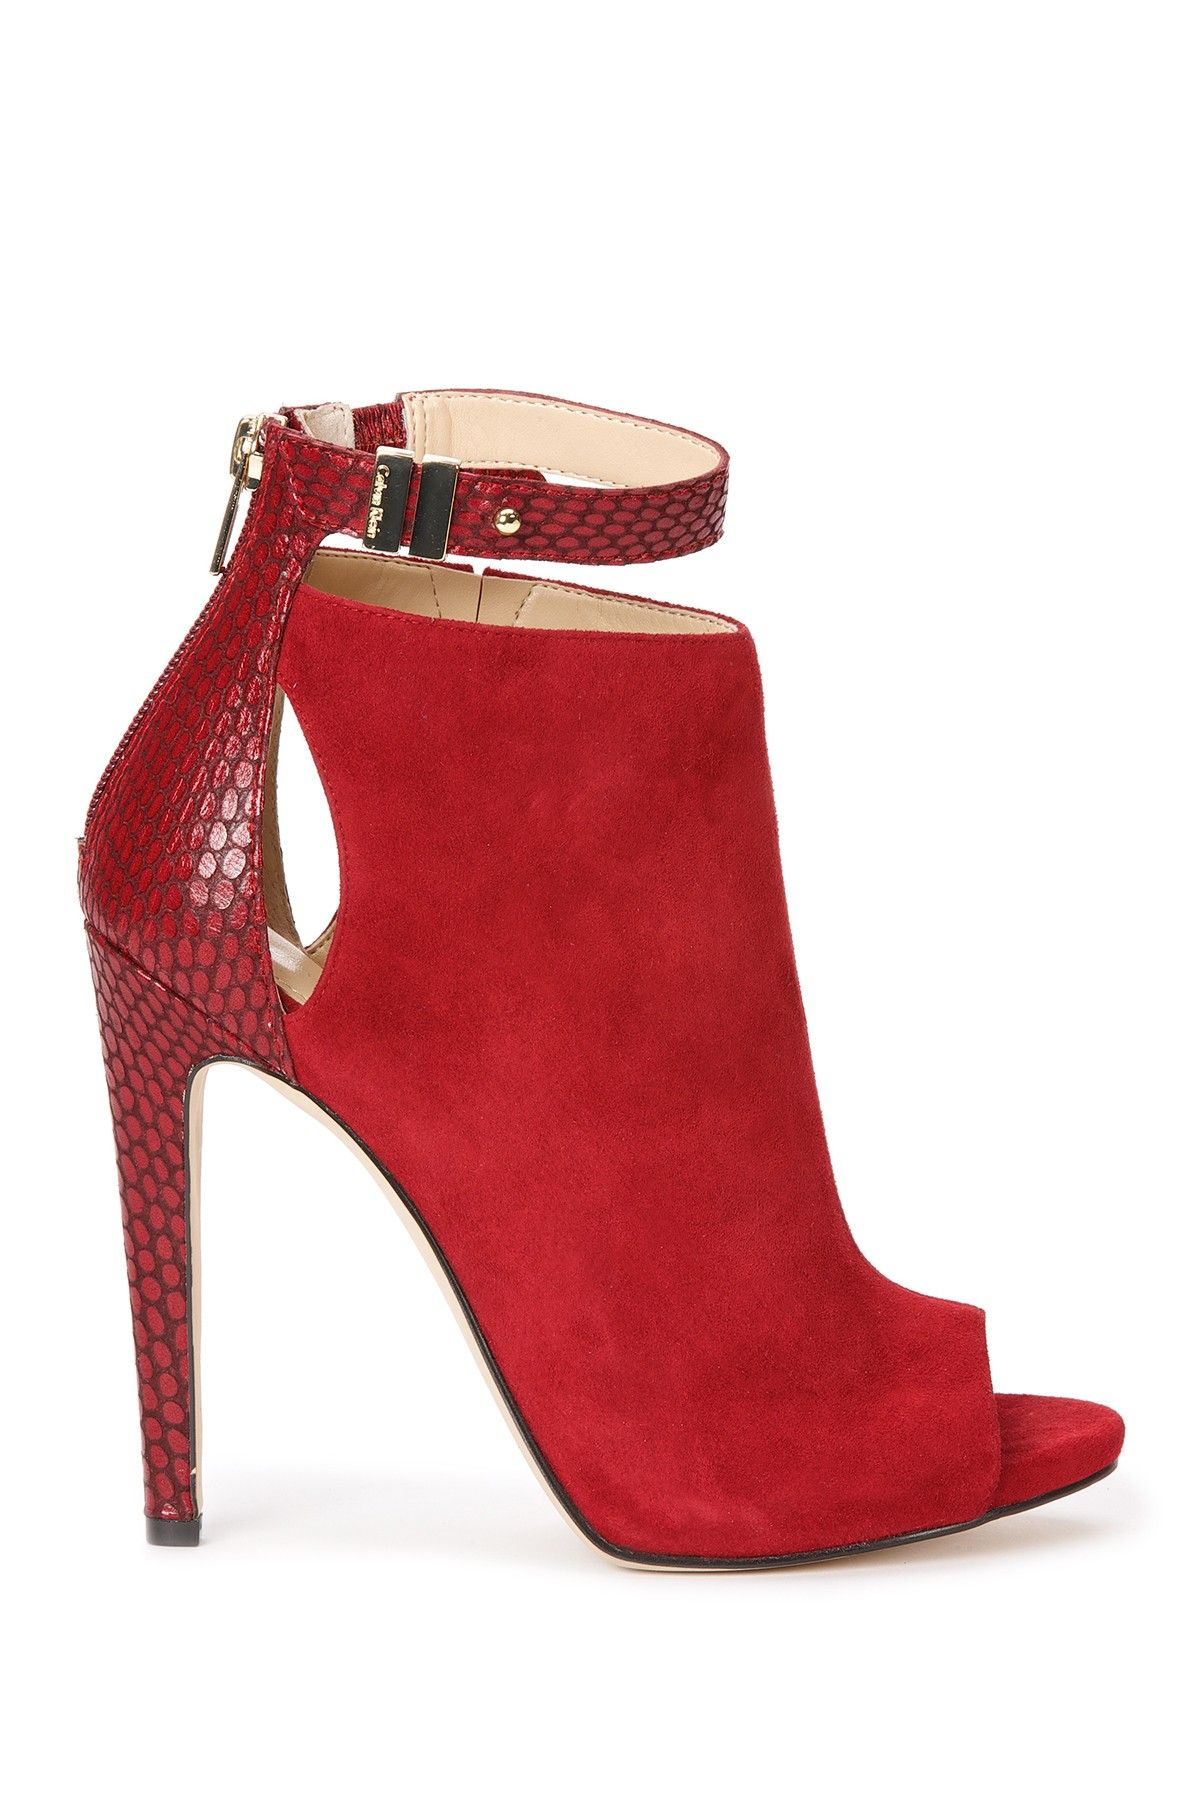 a2627f07336 Calvin Klein | Calvin Klein Saya Open Toe Shoe | Nordstrom Rack ...